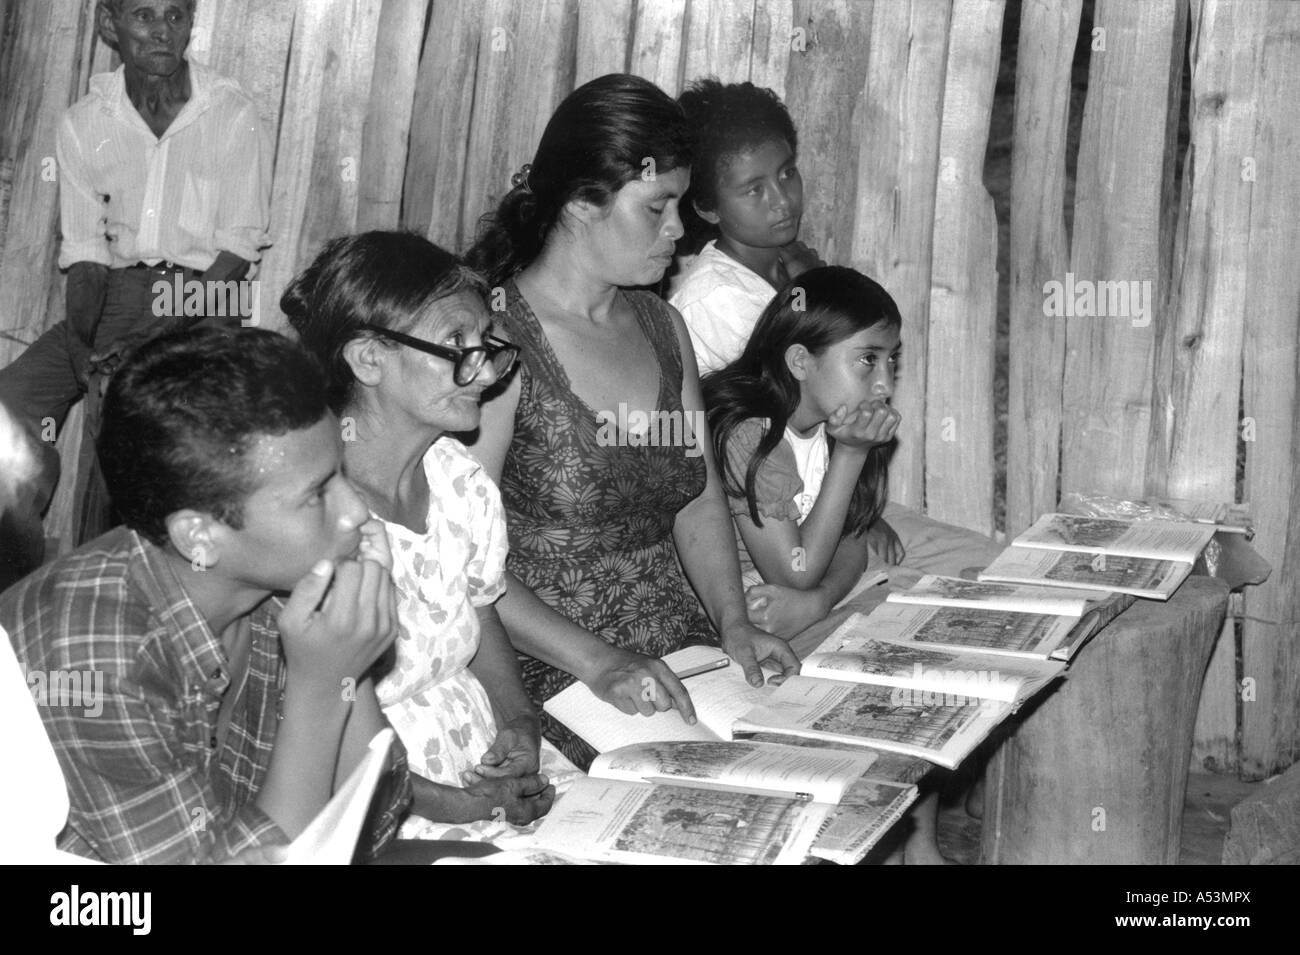 Painet ha1449 274 black and white adult literacy class organised by cntc rural community san pedro sula honduras Stock Photo